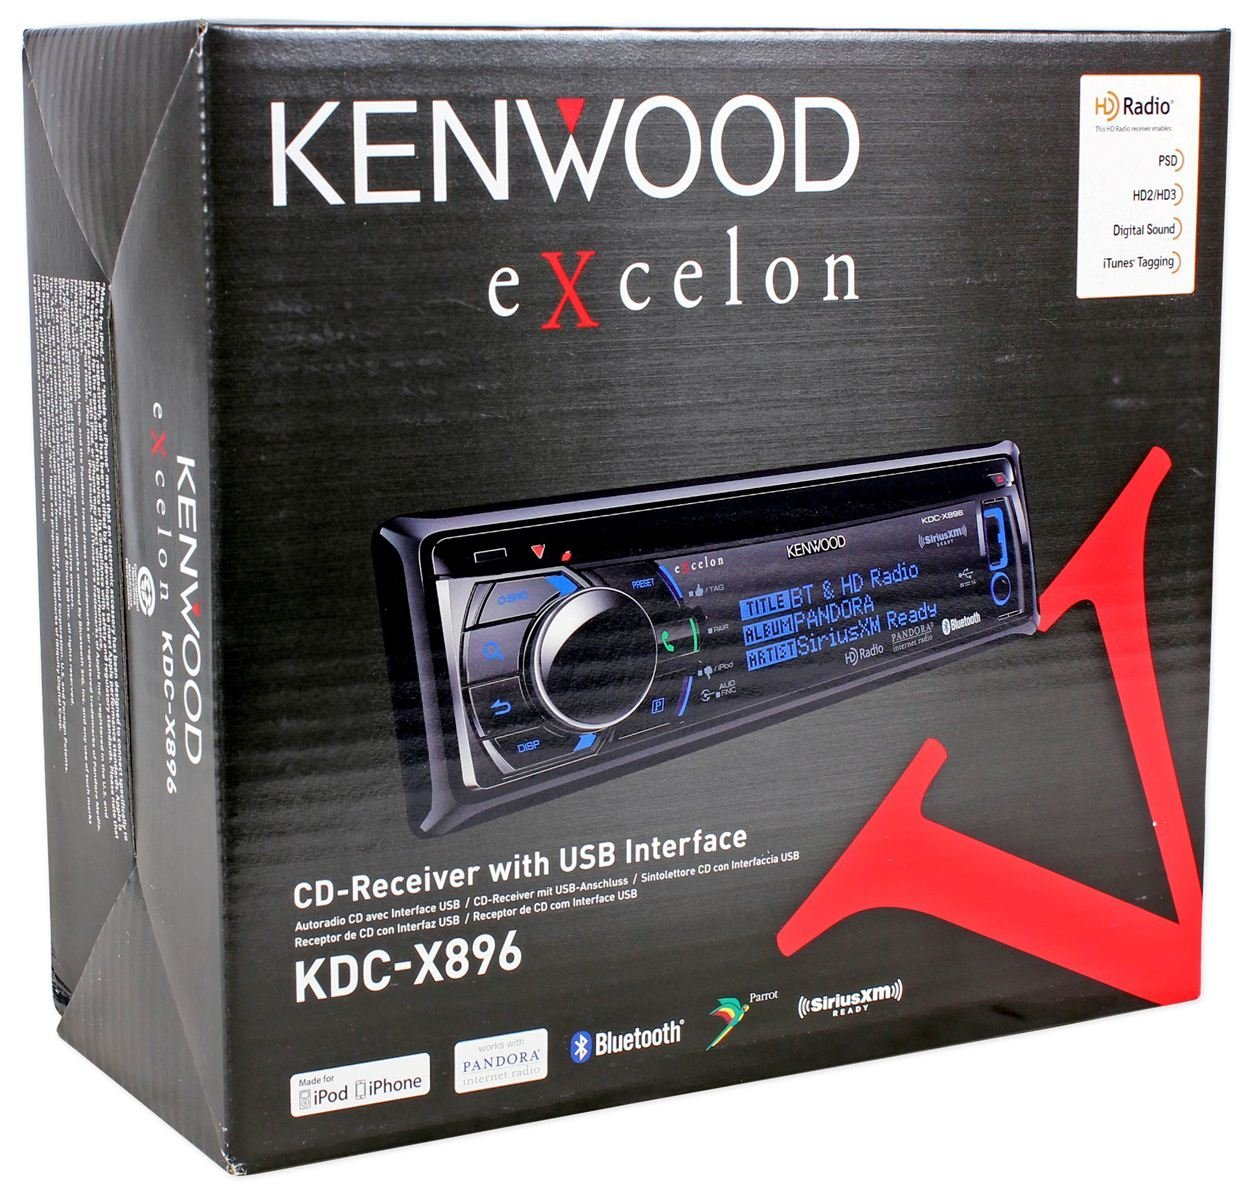 Amazon.com: nd New Kenwood KDC-X896 Single Din In-Dash CD ... on